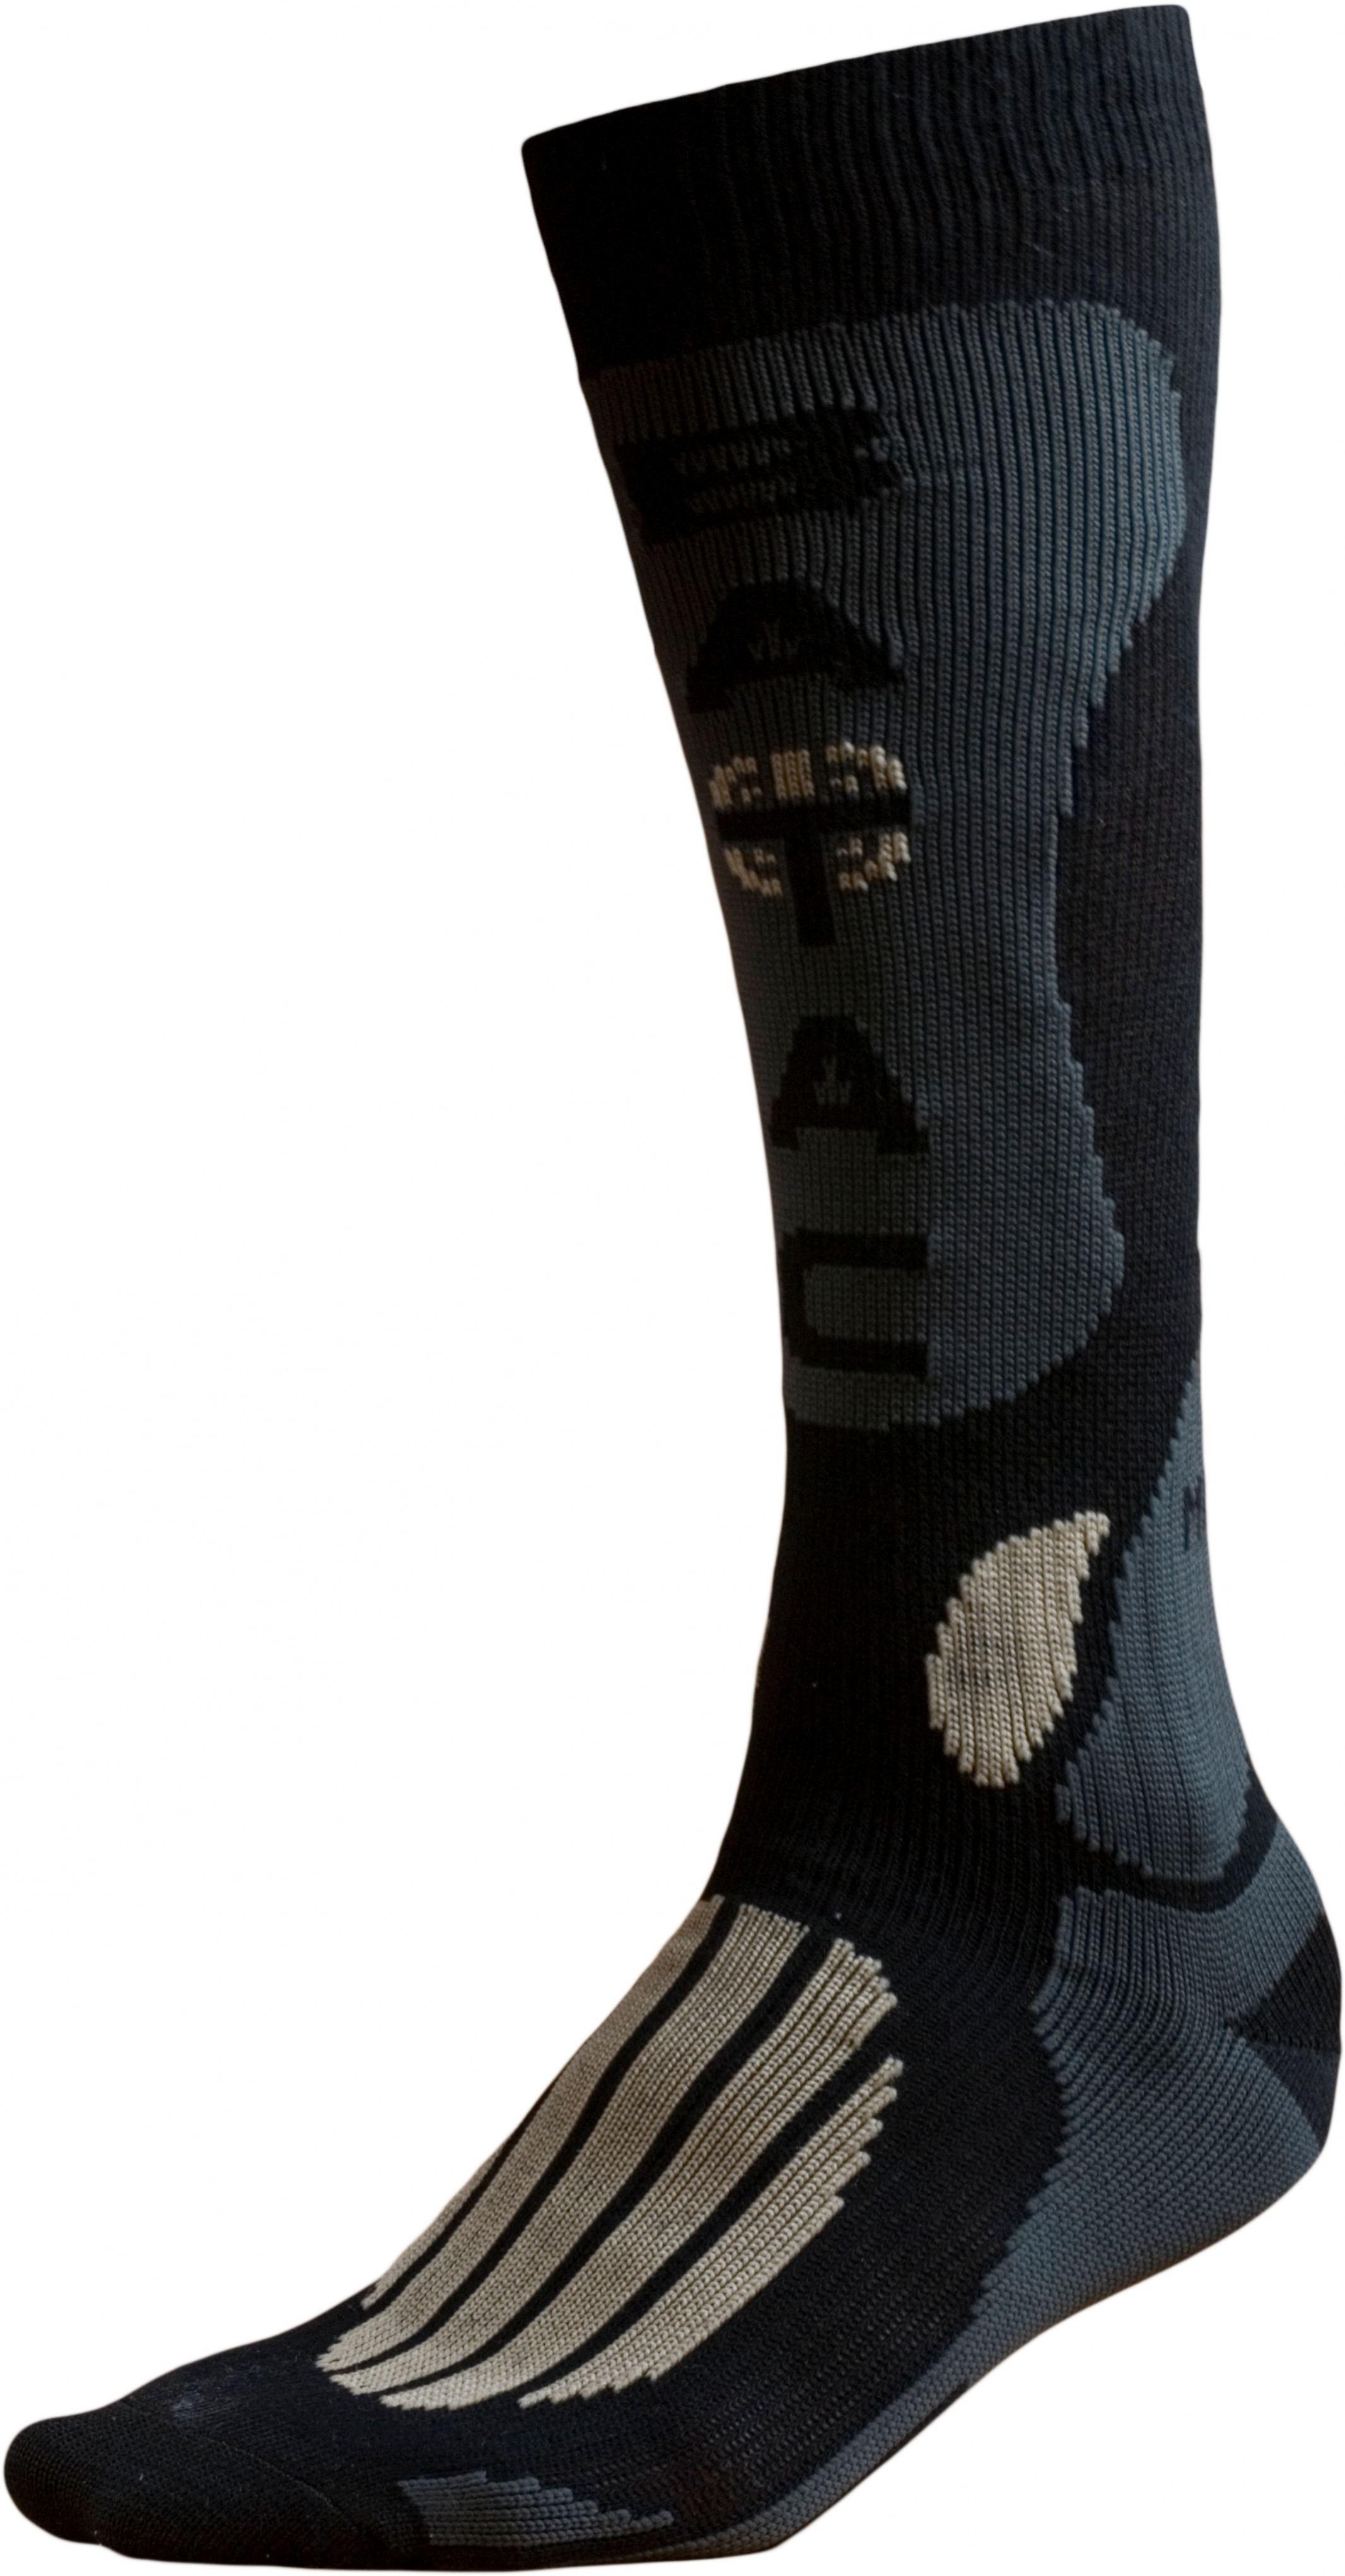 Ponožky BATAC Mission MI01 vel. 36-38 - black/gold